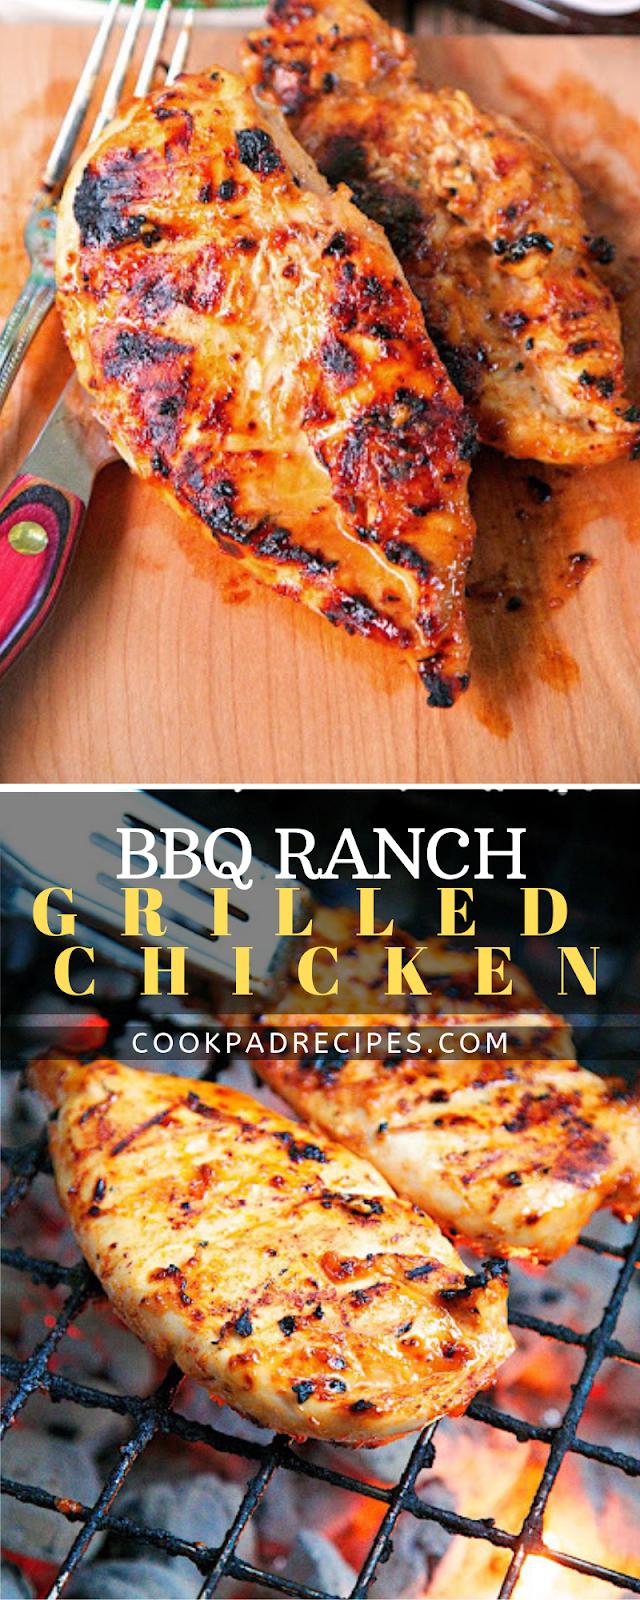 BBQ Rаnсh Grilled Chicken